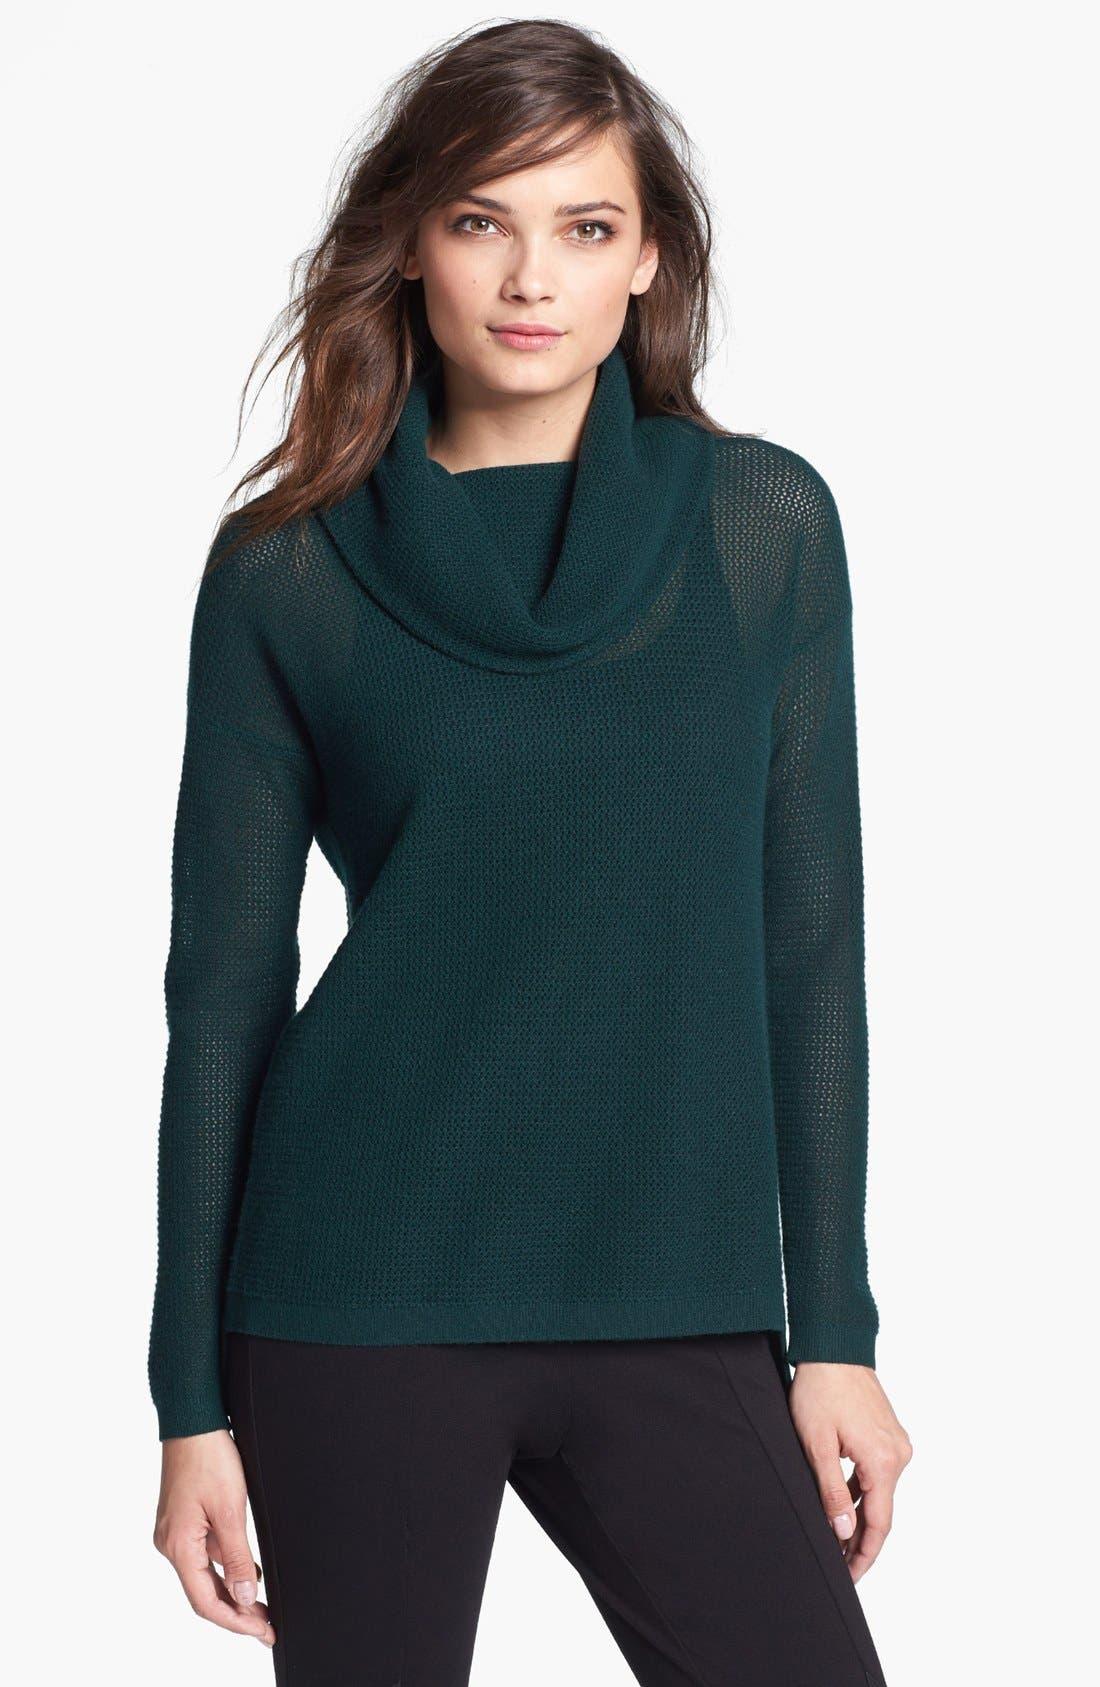 Main Image - Elie Tahari 'Nancy' Faux Wrap Back Cashmere Sweater